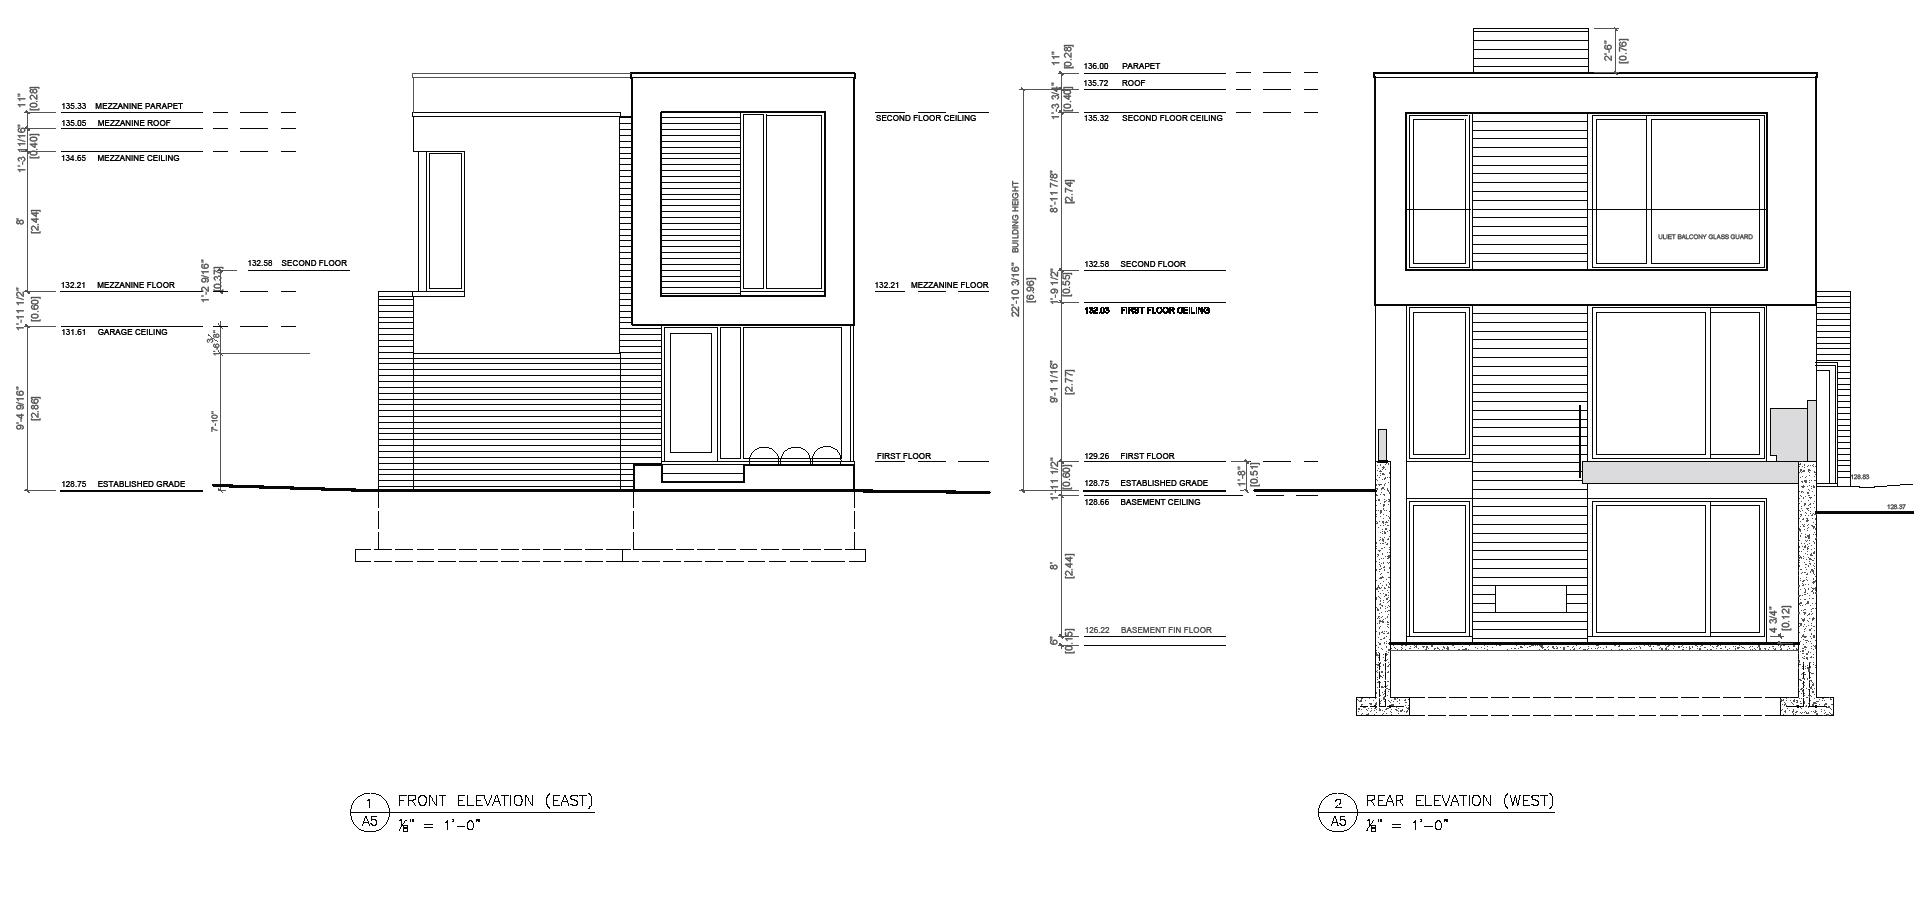 building_permits_2.jpg